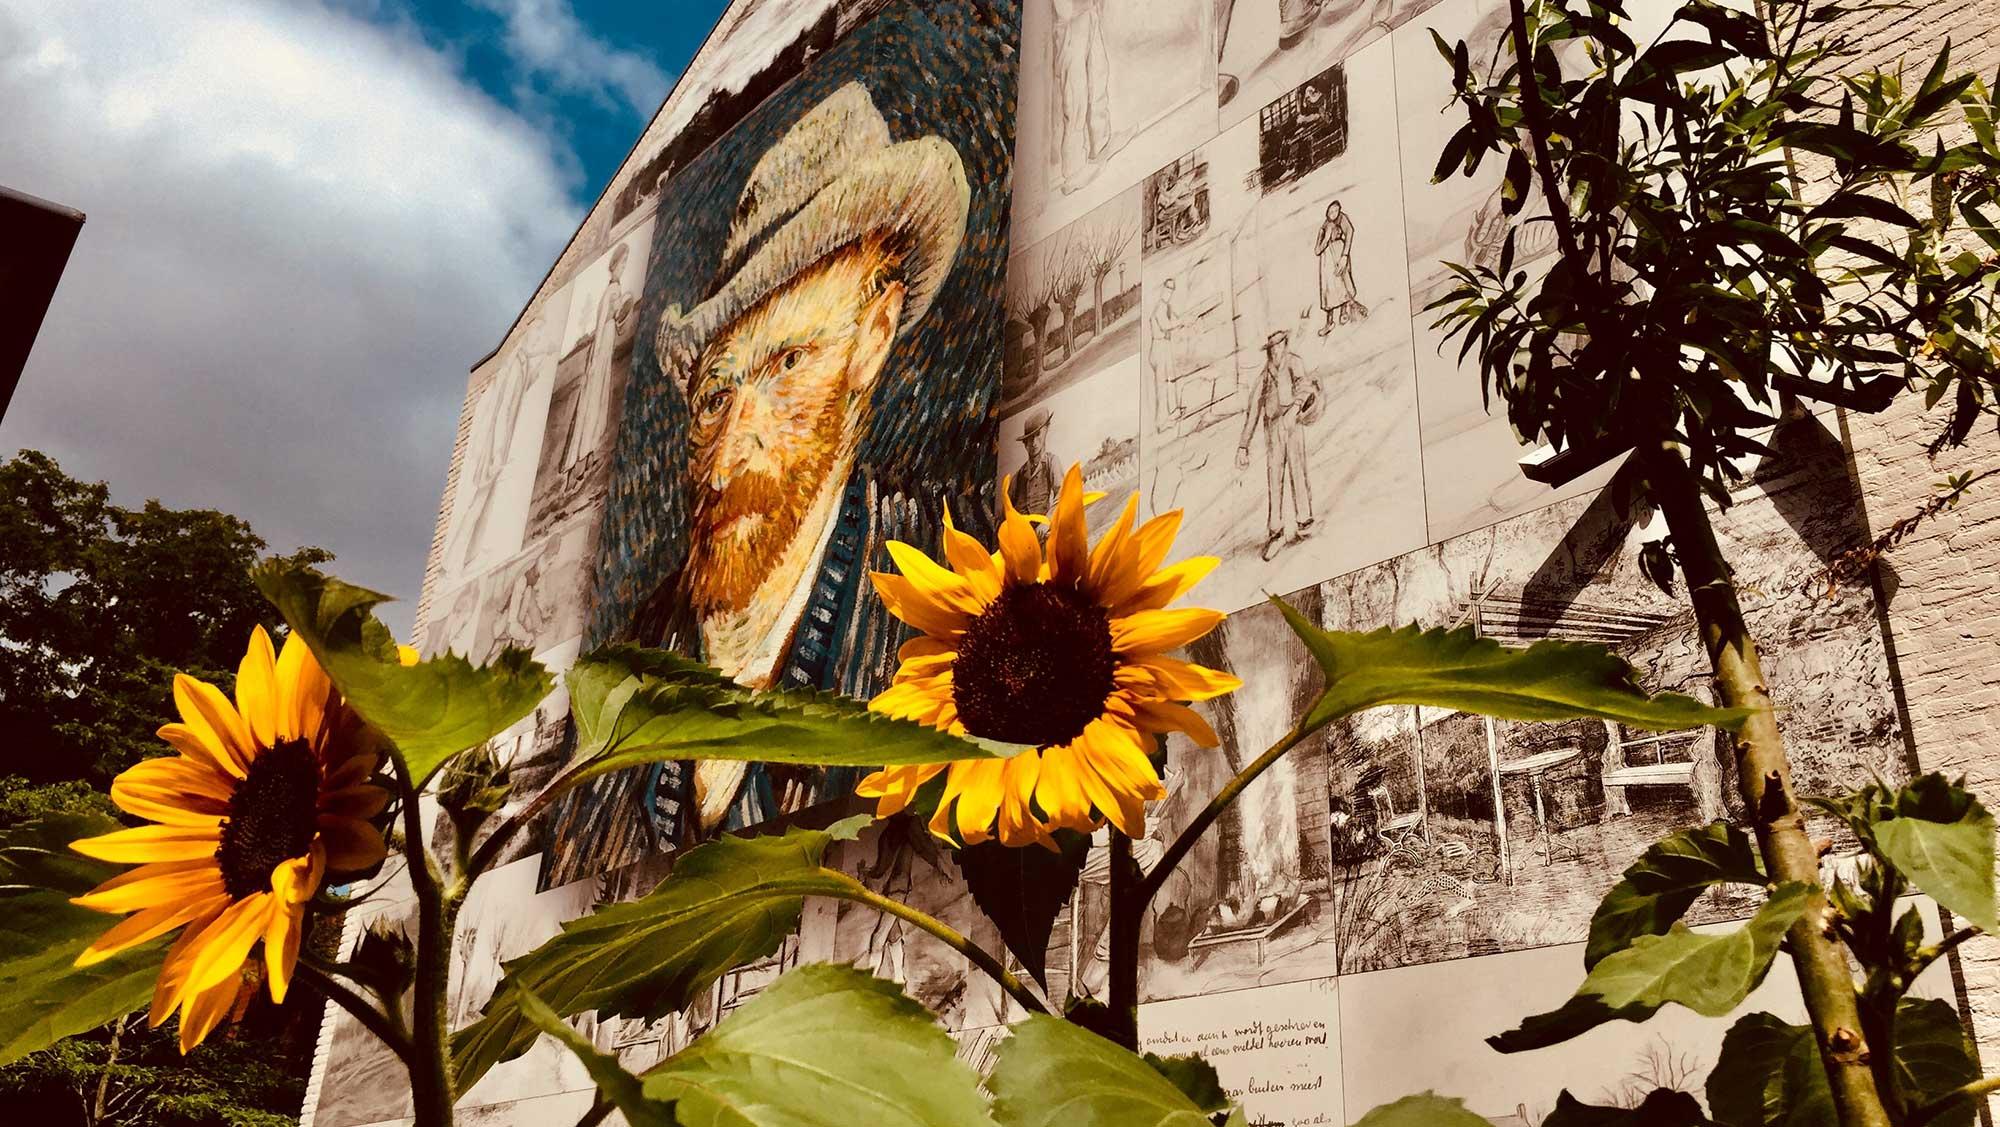 Omgeving Molecaten Park Bosbad Hoeven 17 Vincent van GoghHuis